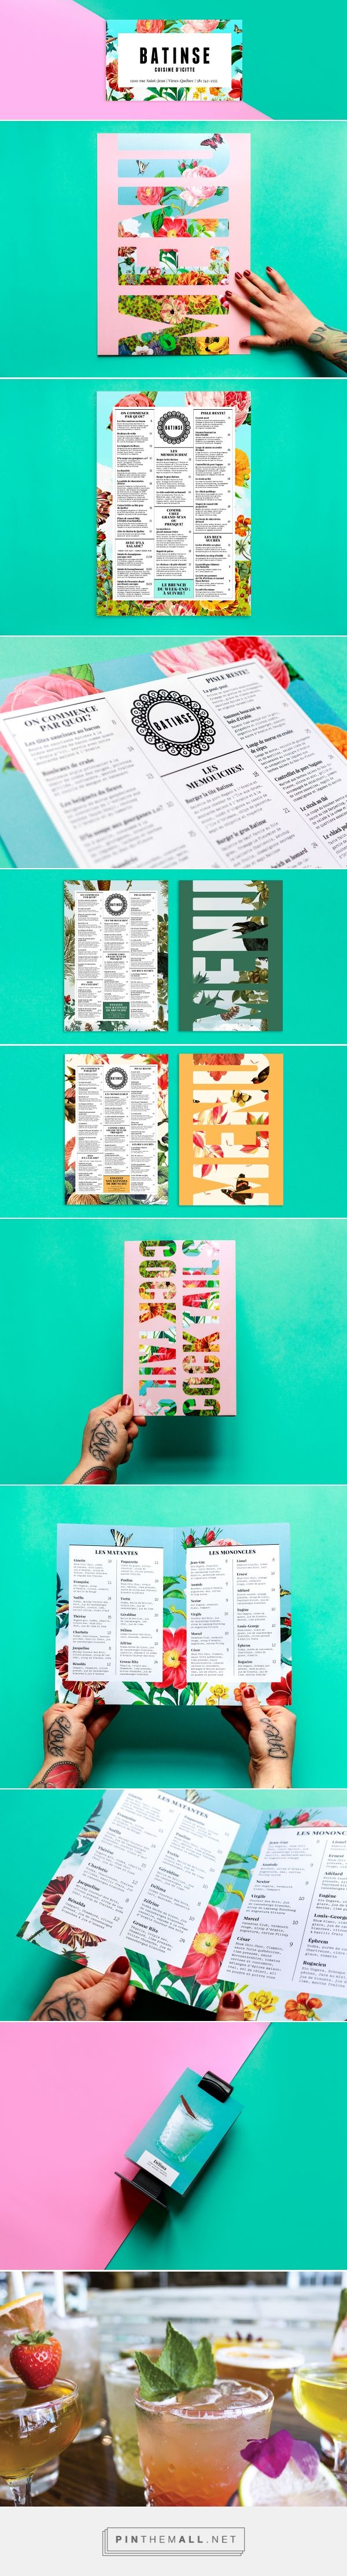 Batinse Restaurant Branding and Menu Design by Antoine Goulet | Fivestar Branding Agency – Design and Branding Agency & Inspiration Gallery